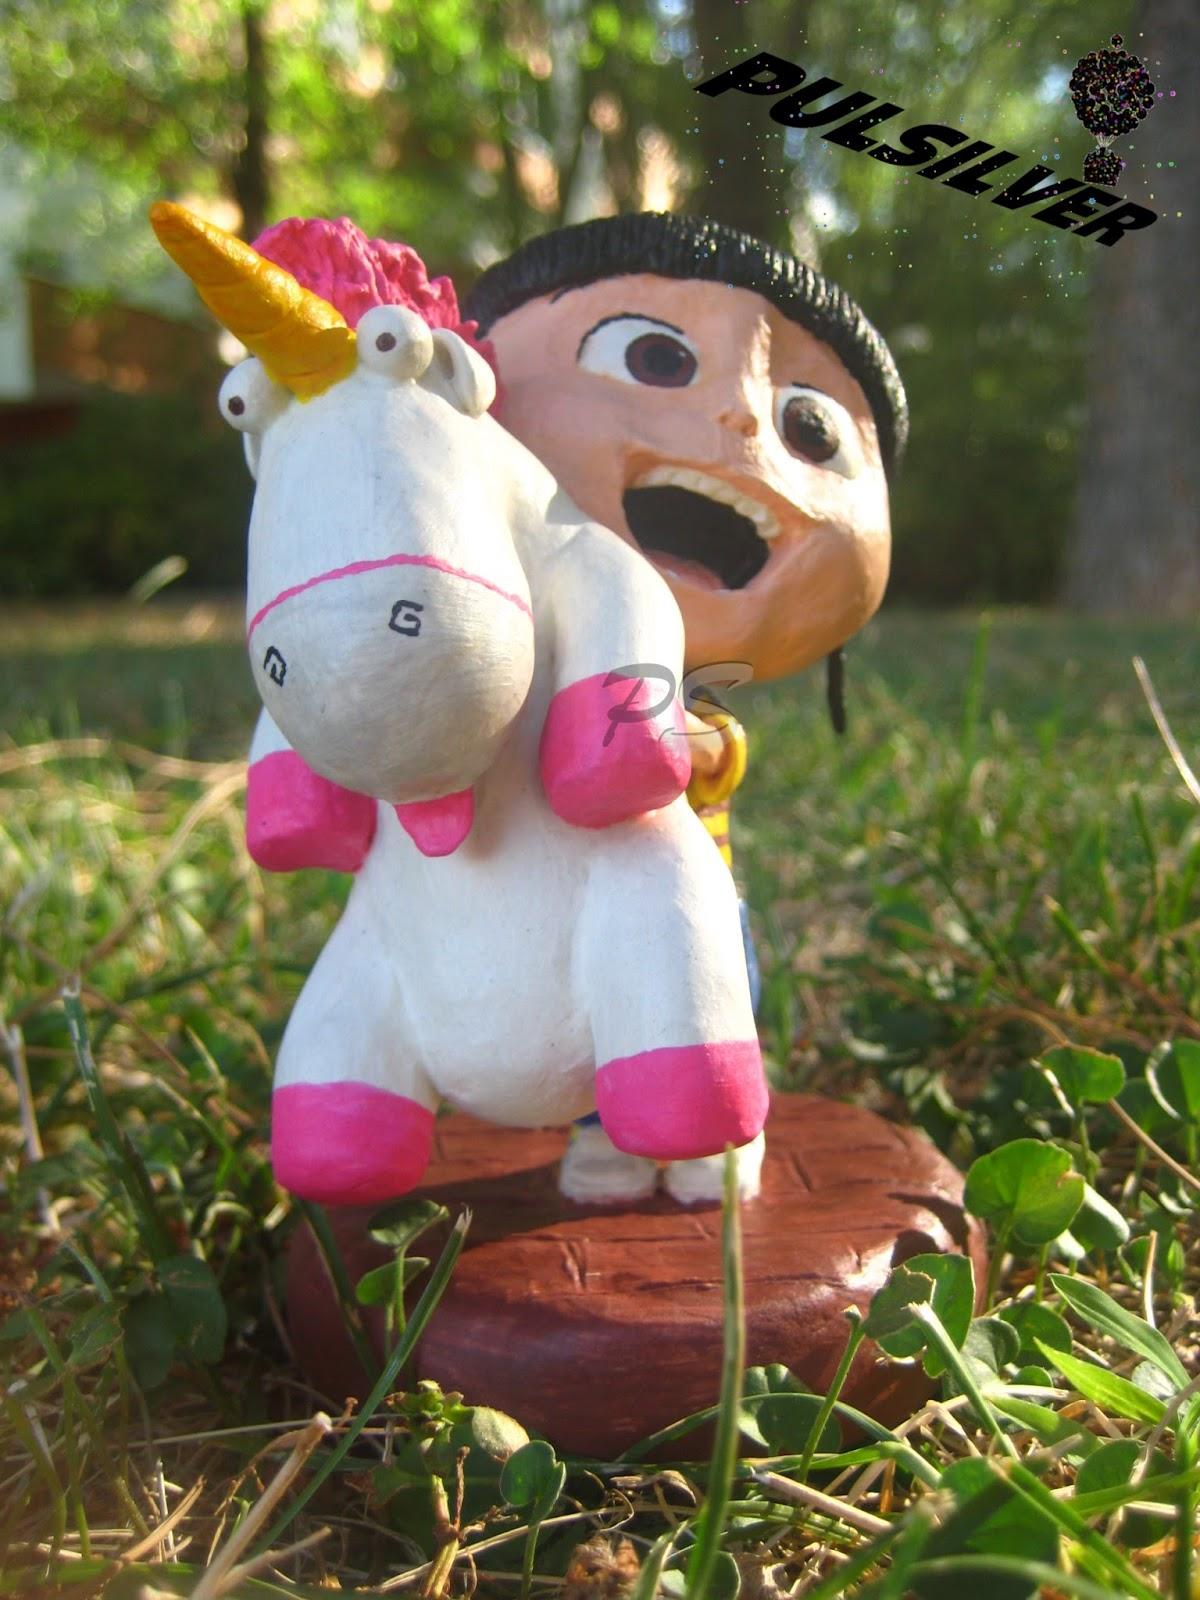 Amigurumi Unicornio Mi Villano Favorito : Pulsilver: Agnes y su Unicornio - Gru, mi villano favorito